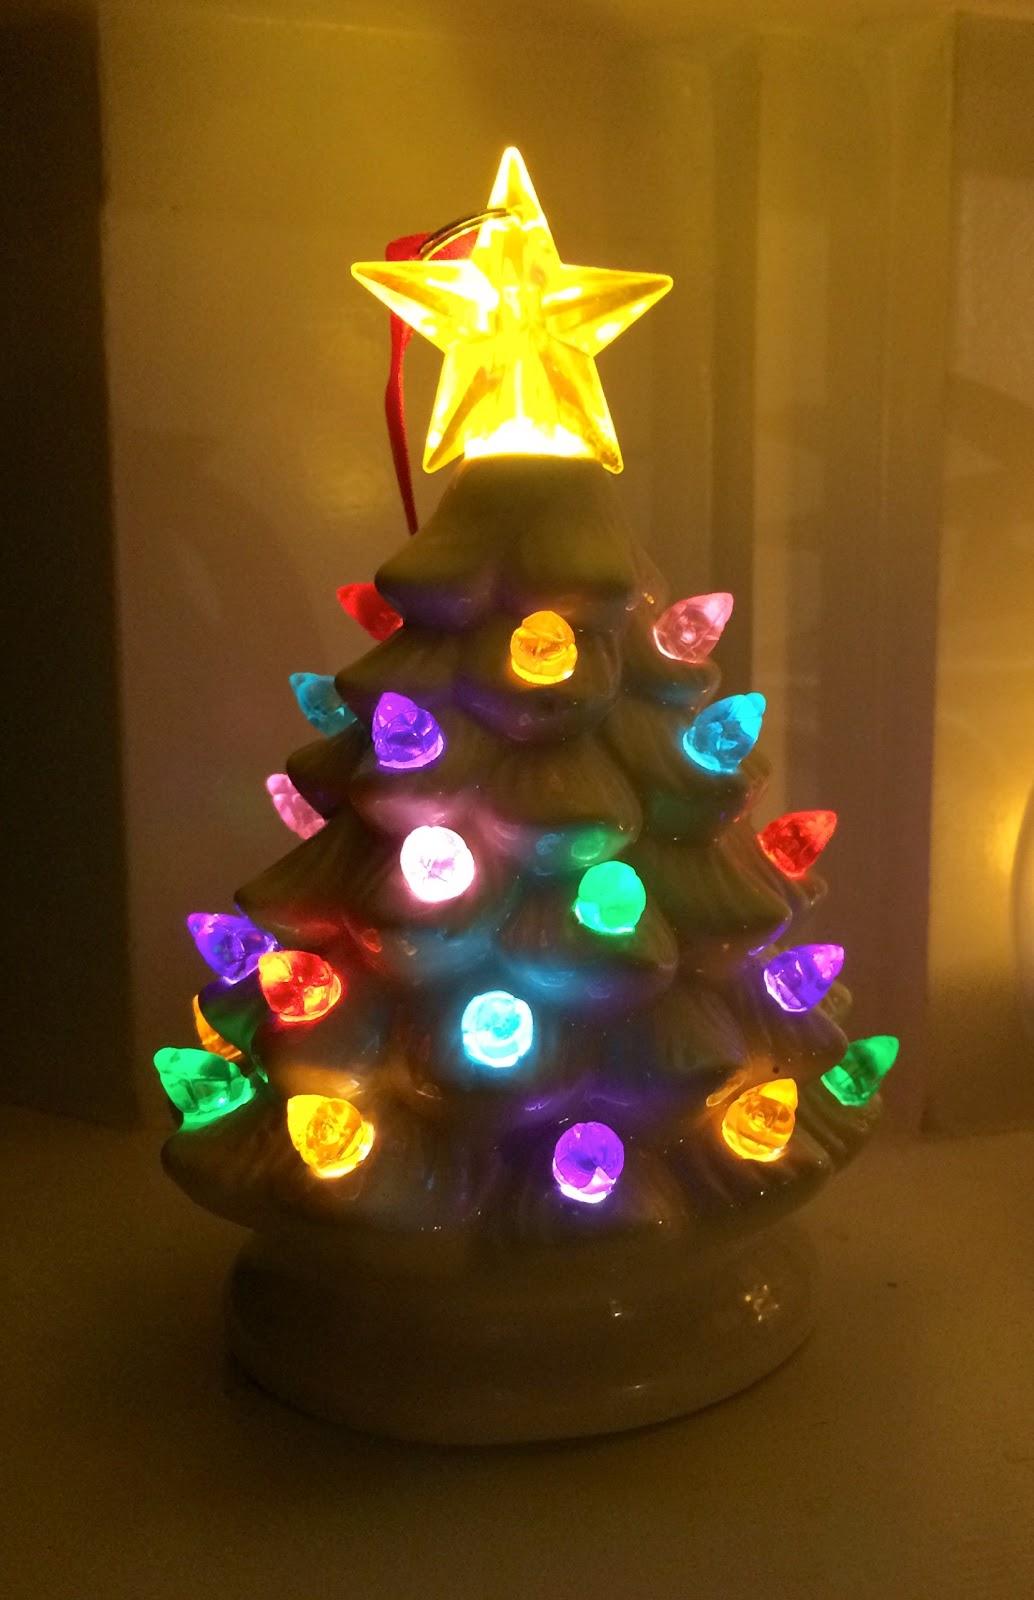 blue skies for me please qvcs mr christmas set of four mini nostalgic tree ornaments review - Mr Christmas Tree